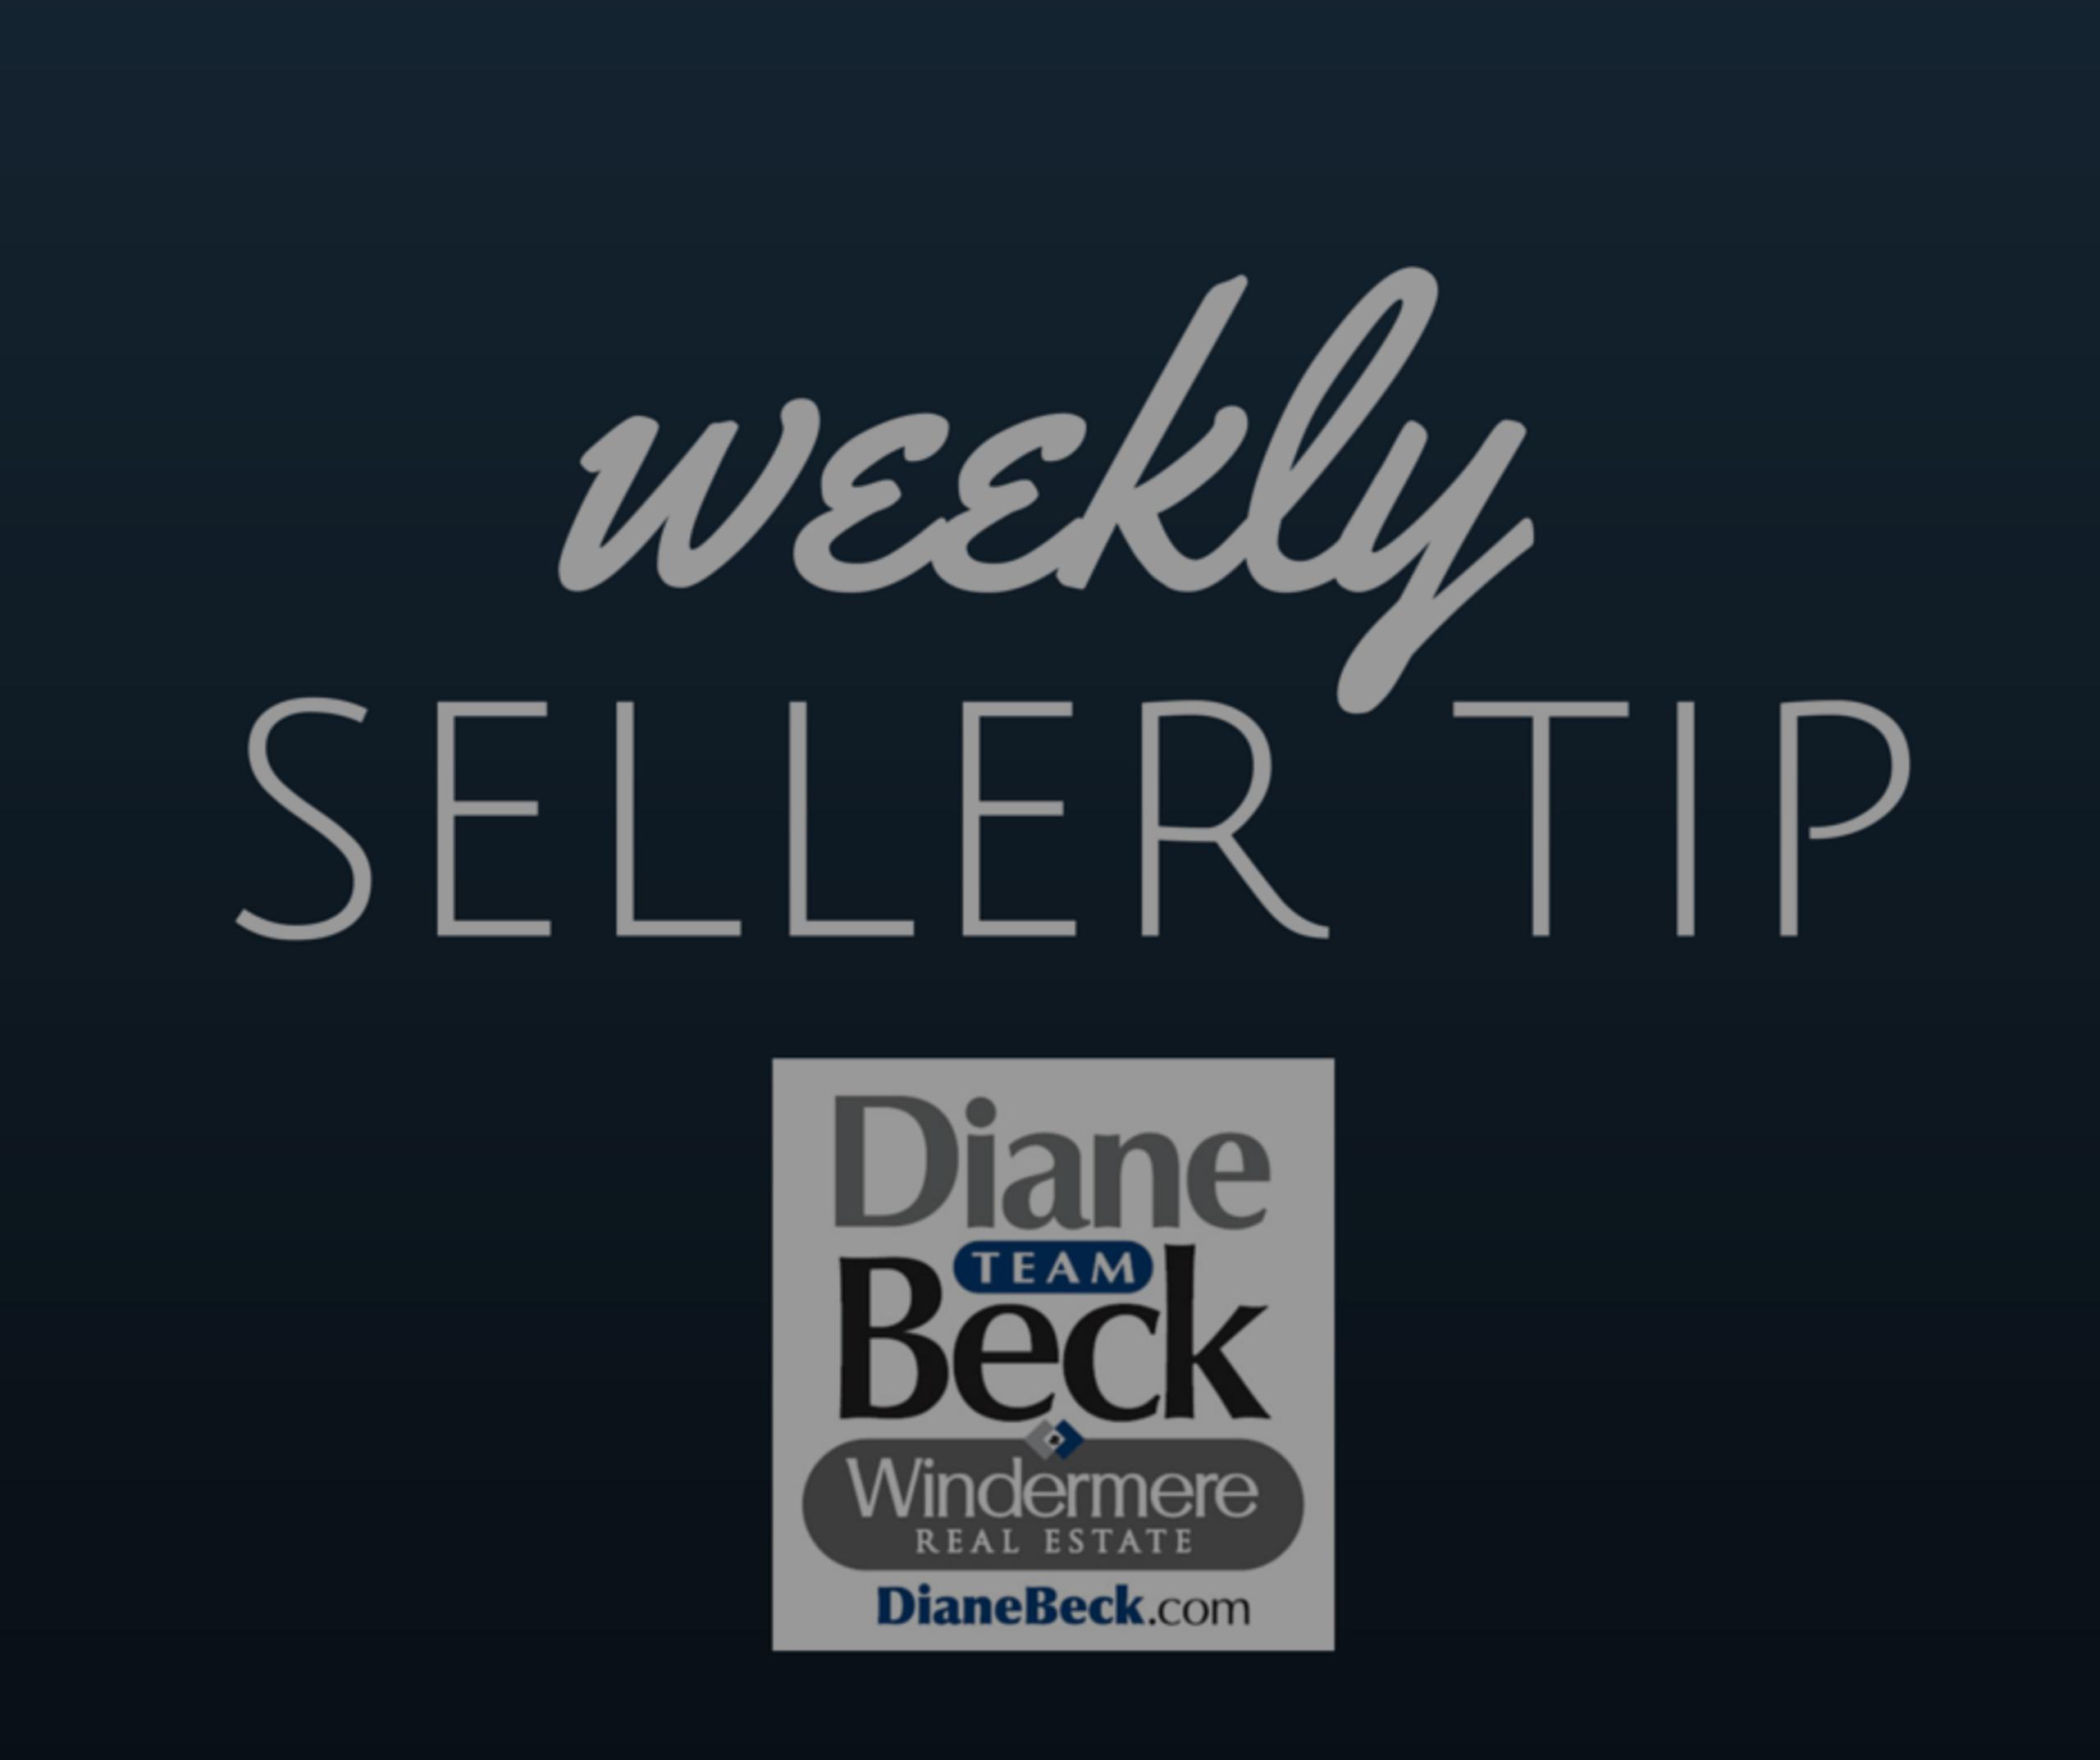 Weekly Tip for Sellers